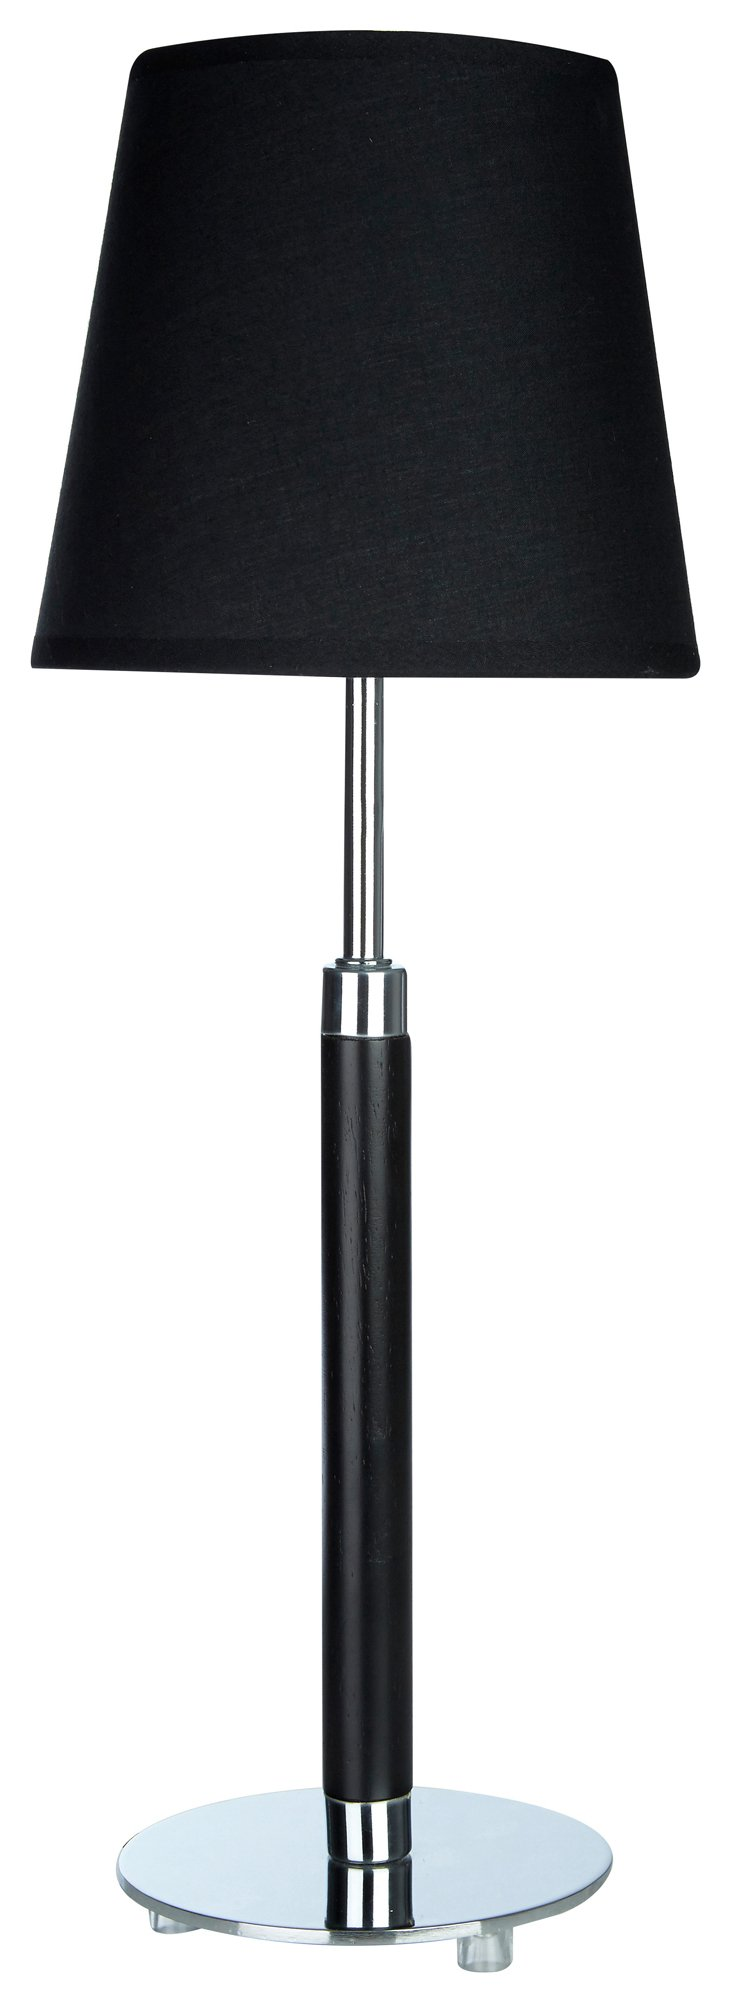 Image of Whitney - Table Lamp - Chrome & Black